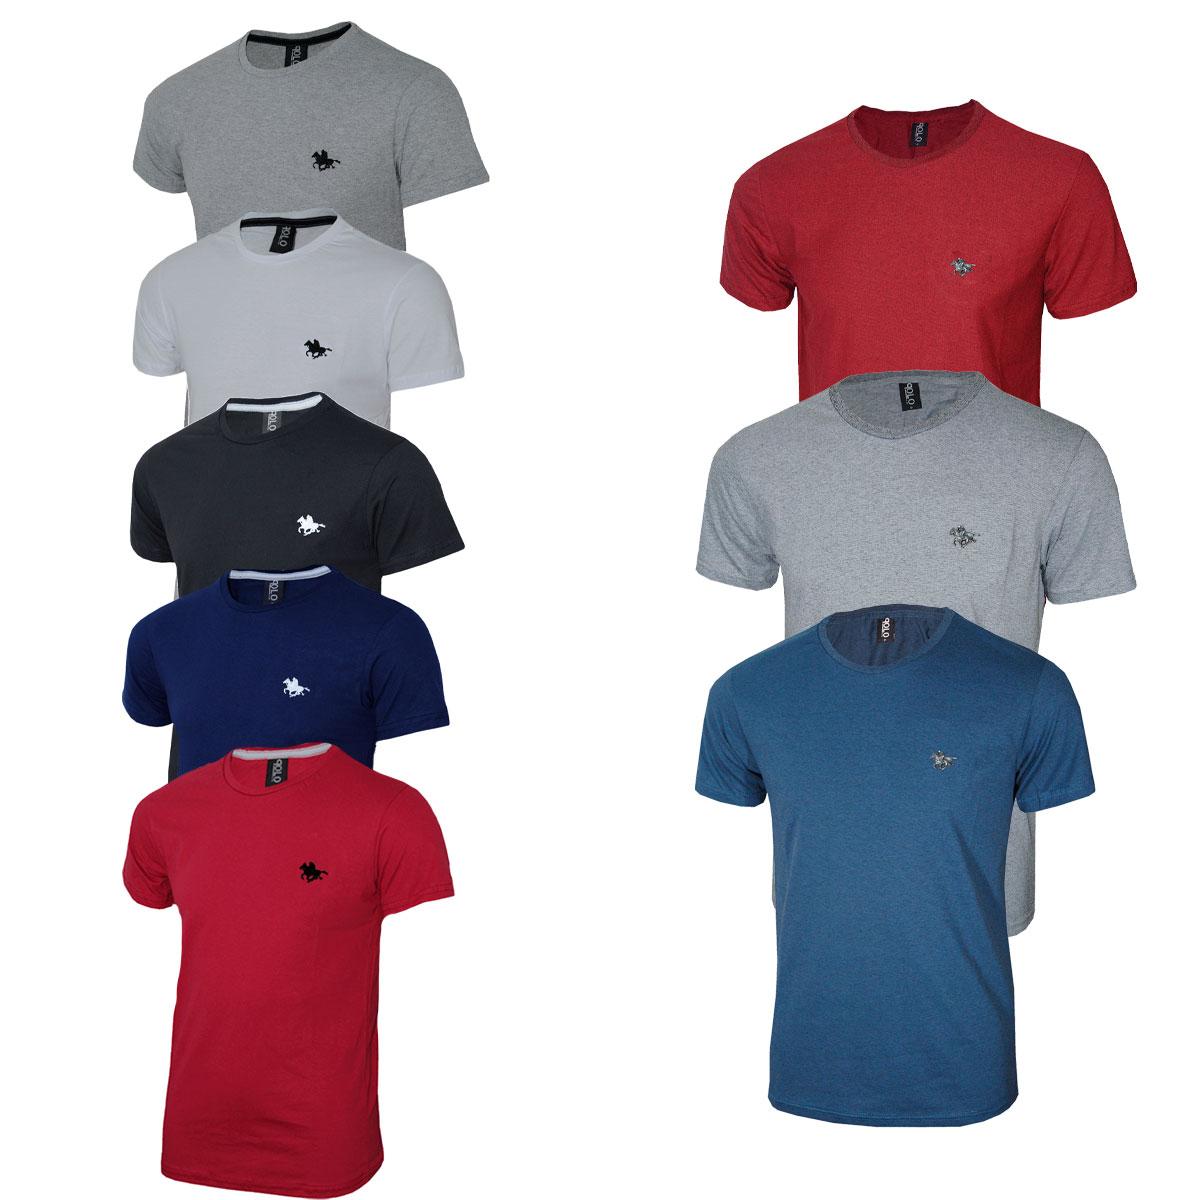 Kit  08 Camisetas Masculinas Blusa Polo RG518 Original